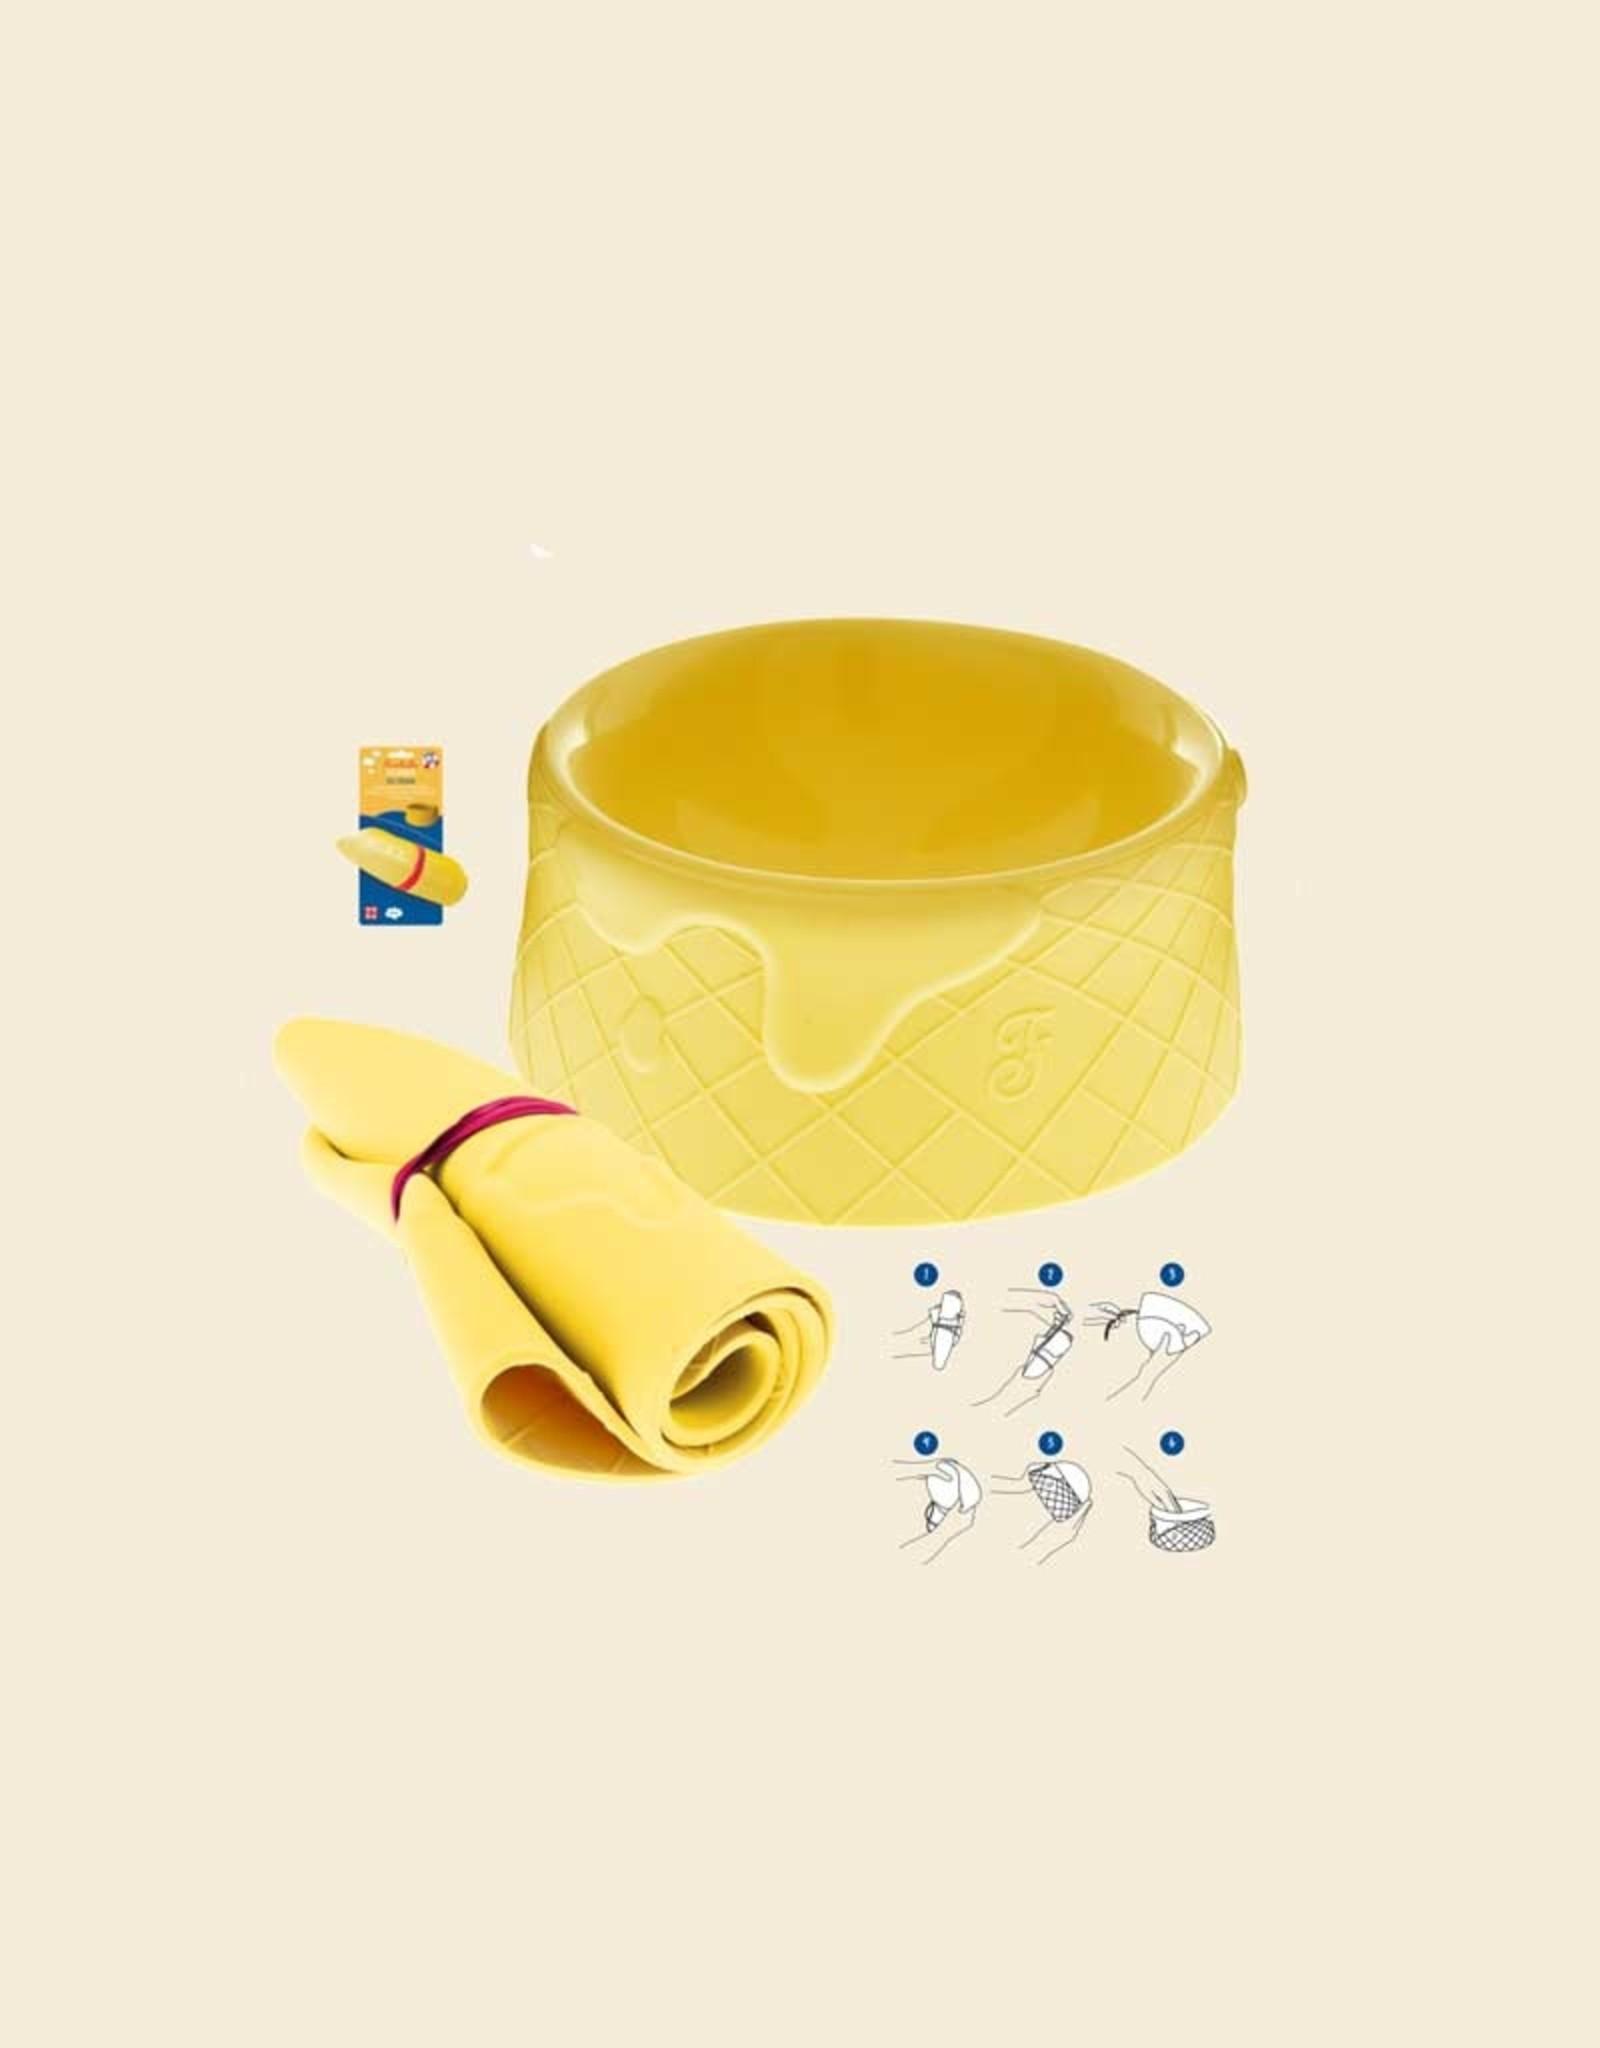 Zomerbox met Speeltje, Drinkbakje & Koelmat